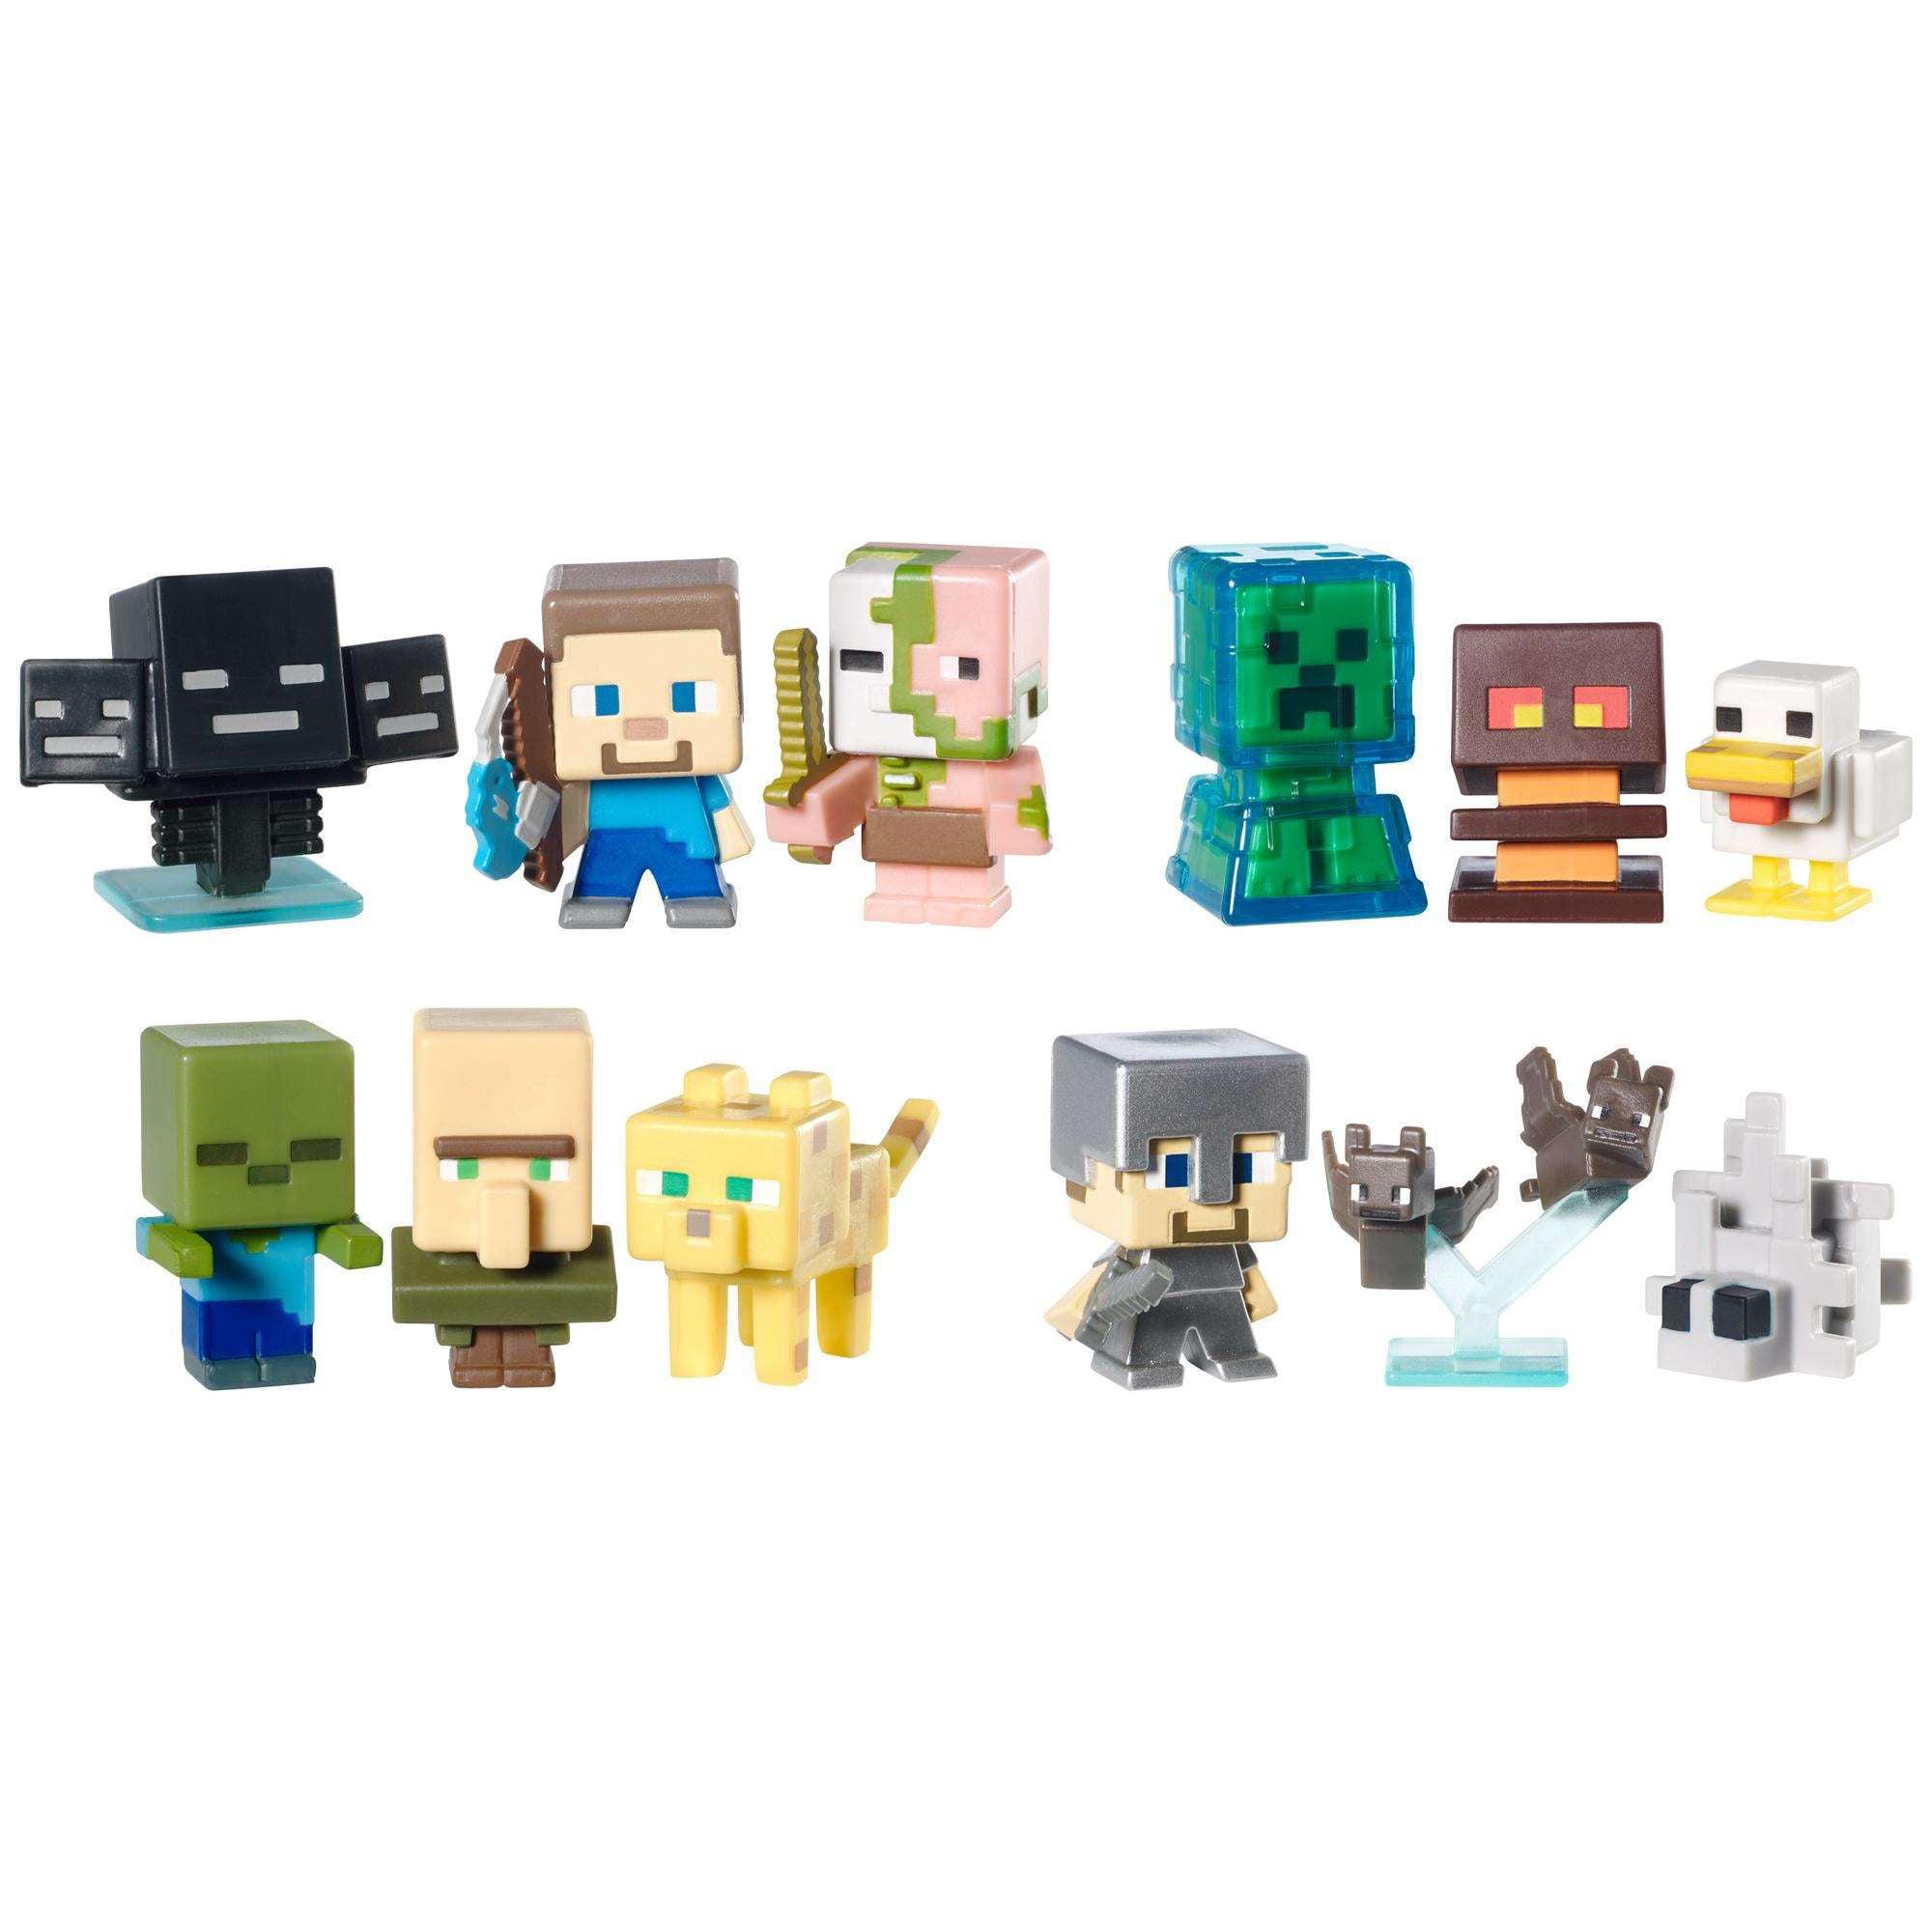 Minecraft Mini-Figure, 3-Pack Assortment by Funtastic